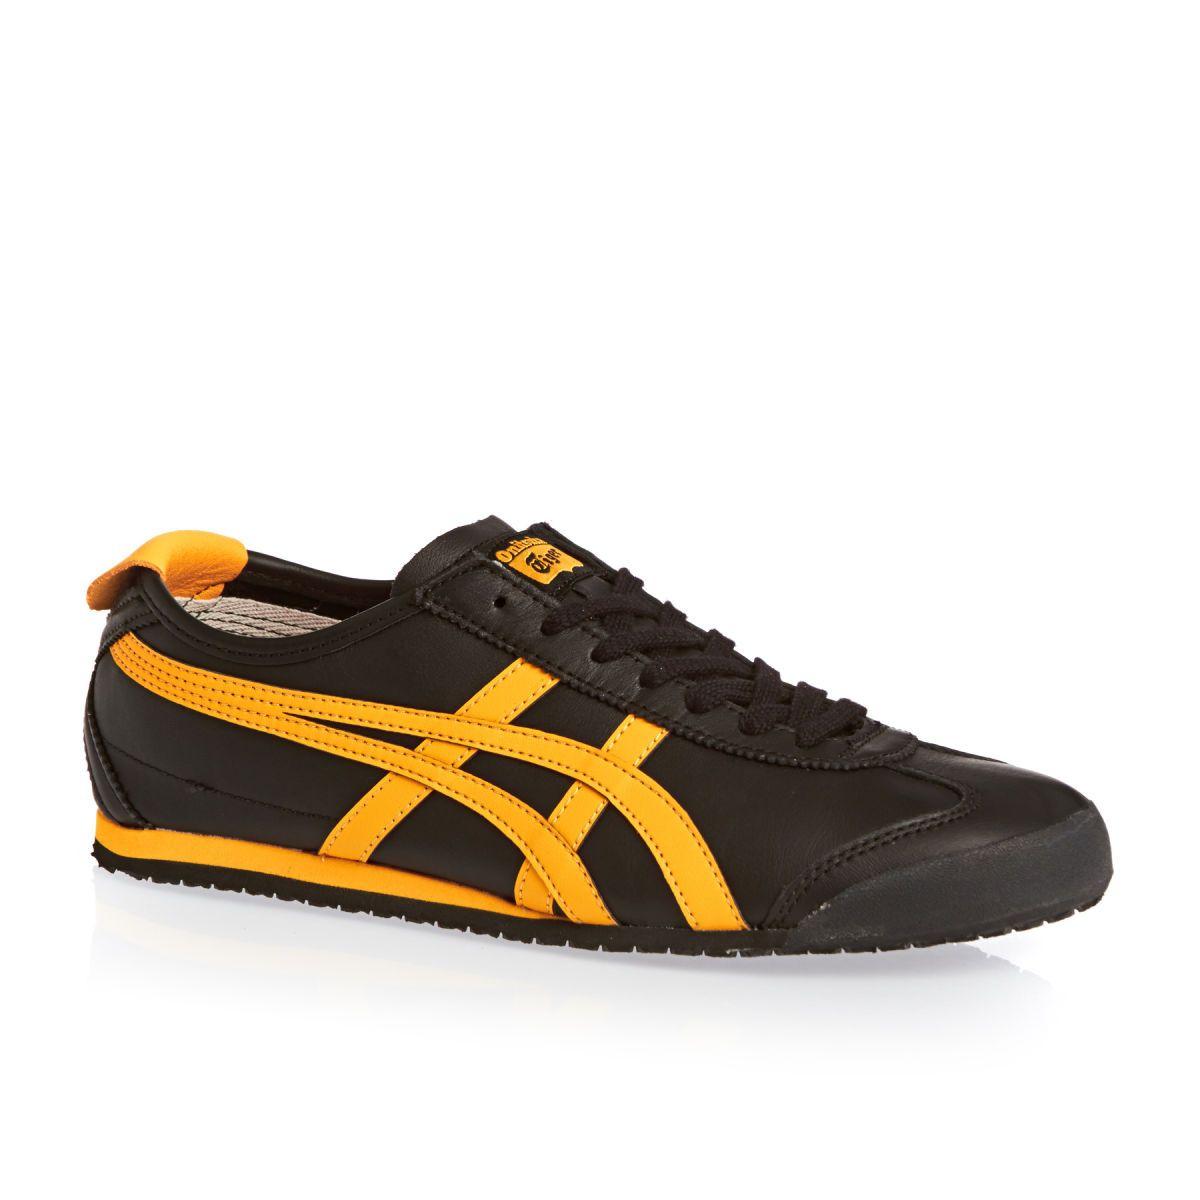 brand new 6d098 86a18 Onitsuka Tiger Shoes - Onitsuka Tiger Mexico 66 Shoes ...